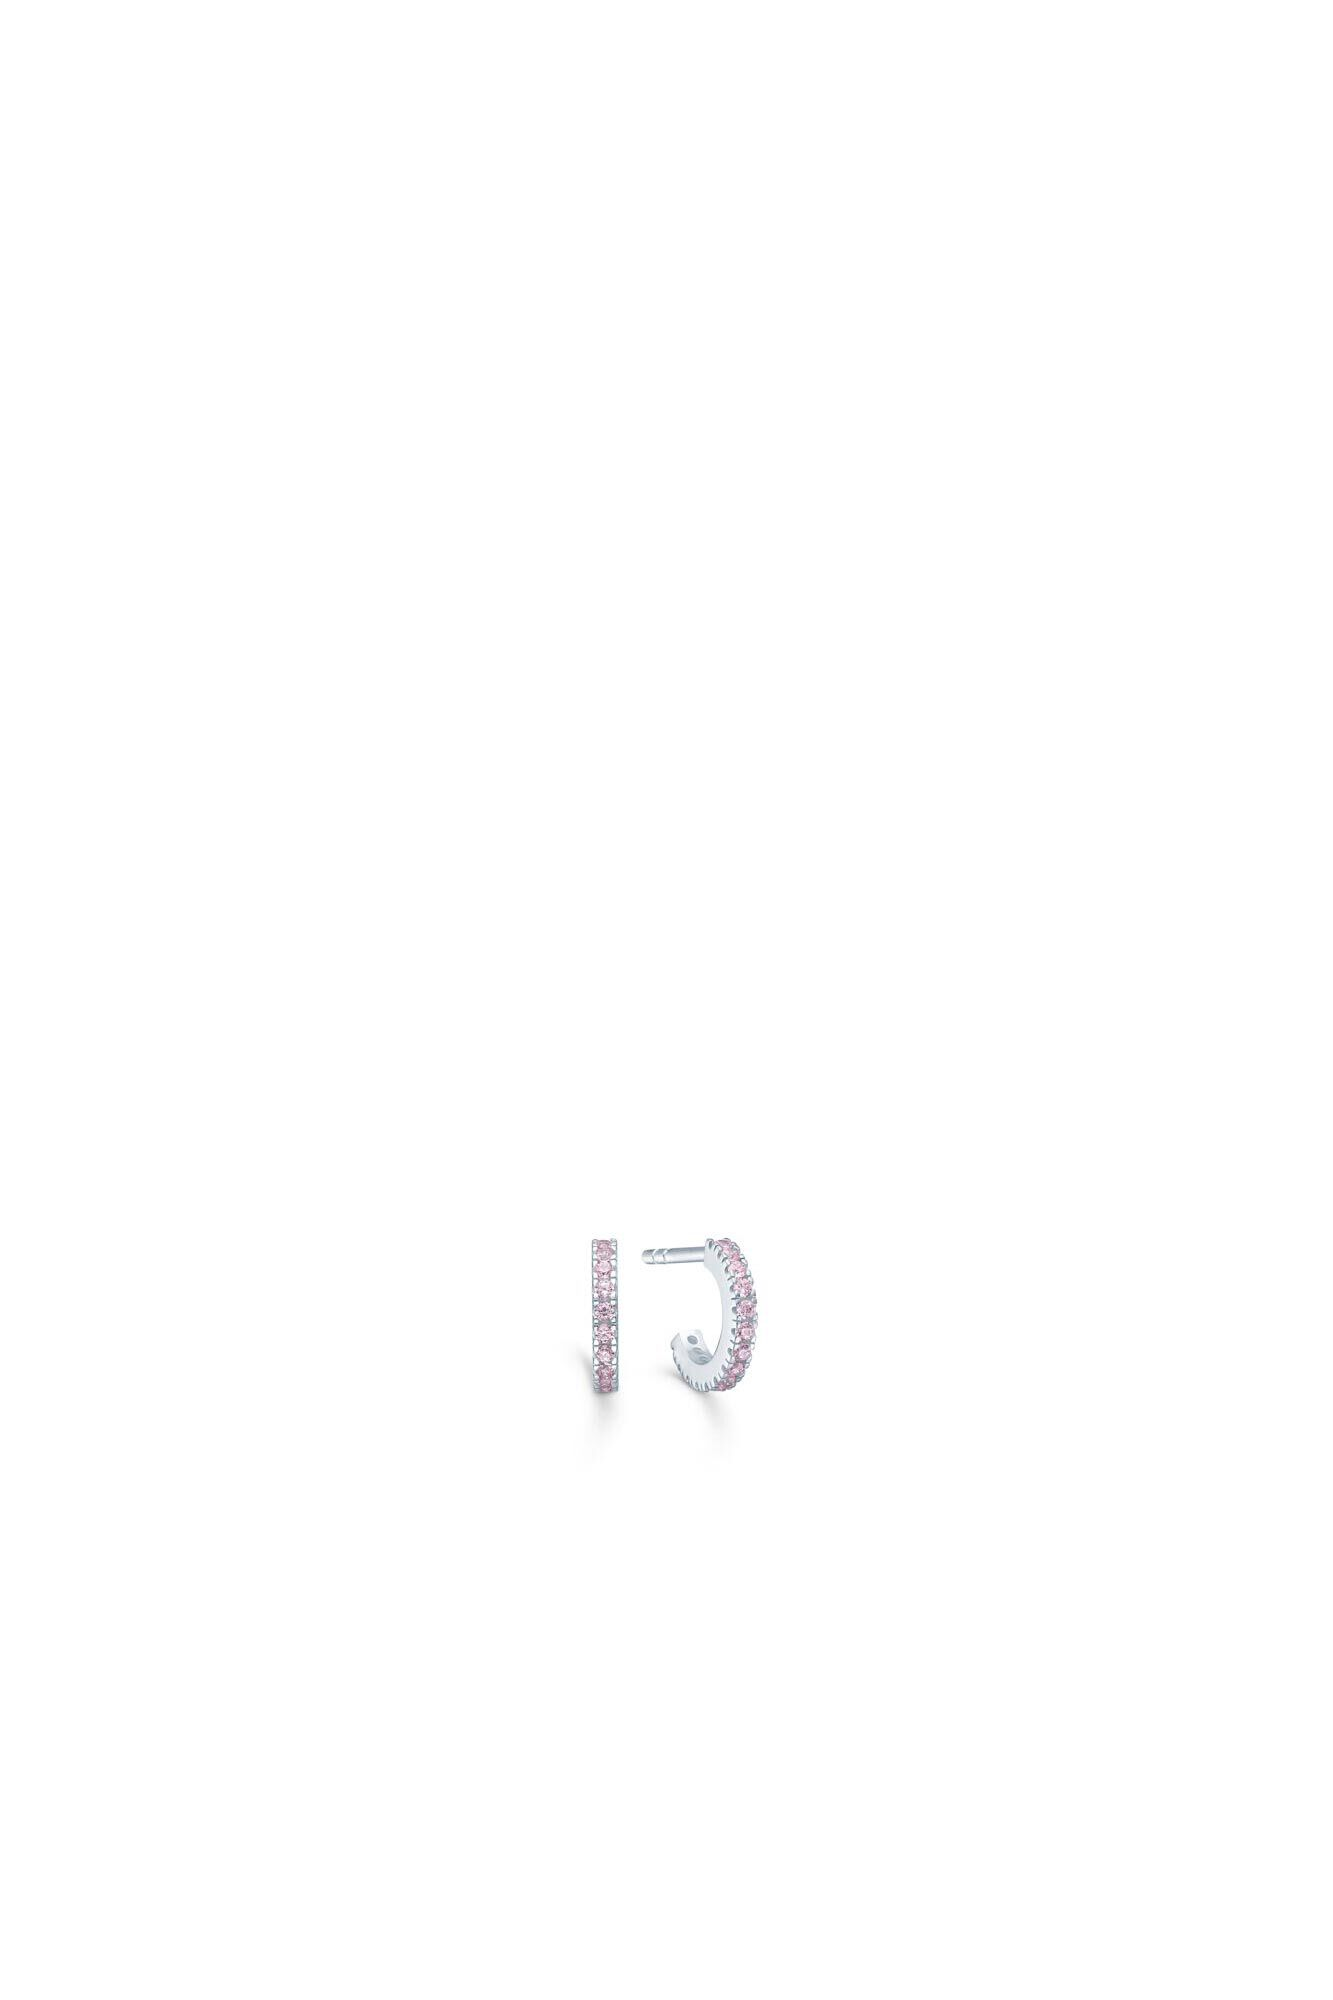 Simplicity mini hoops IDEH009R, RHODIUM/PINK